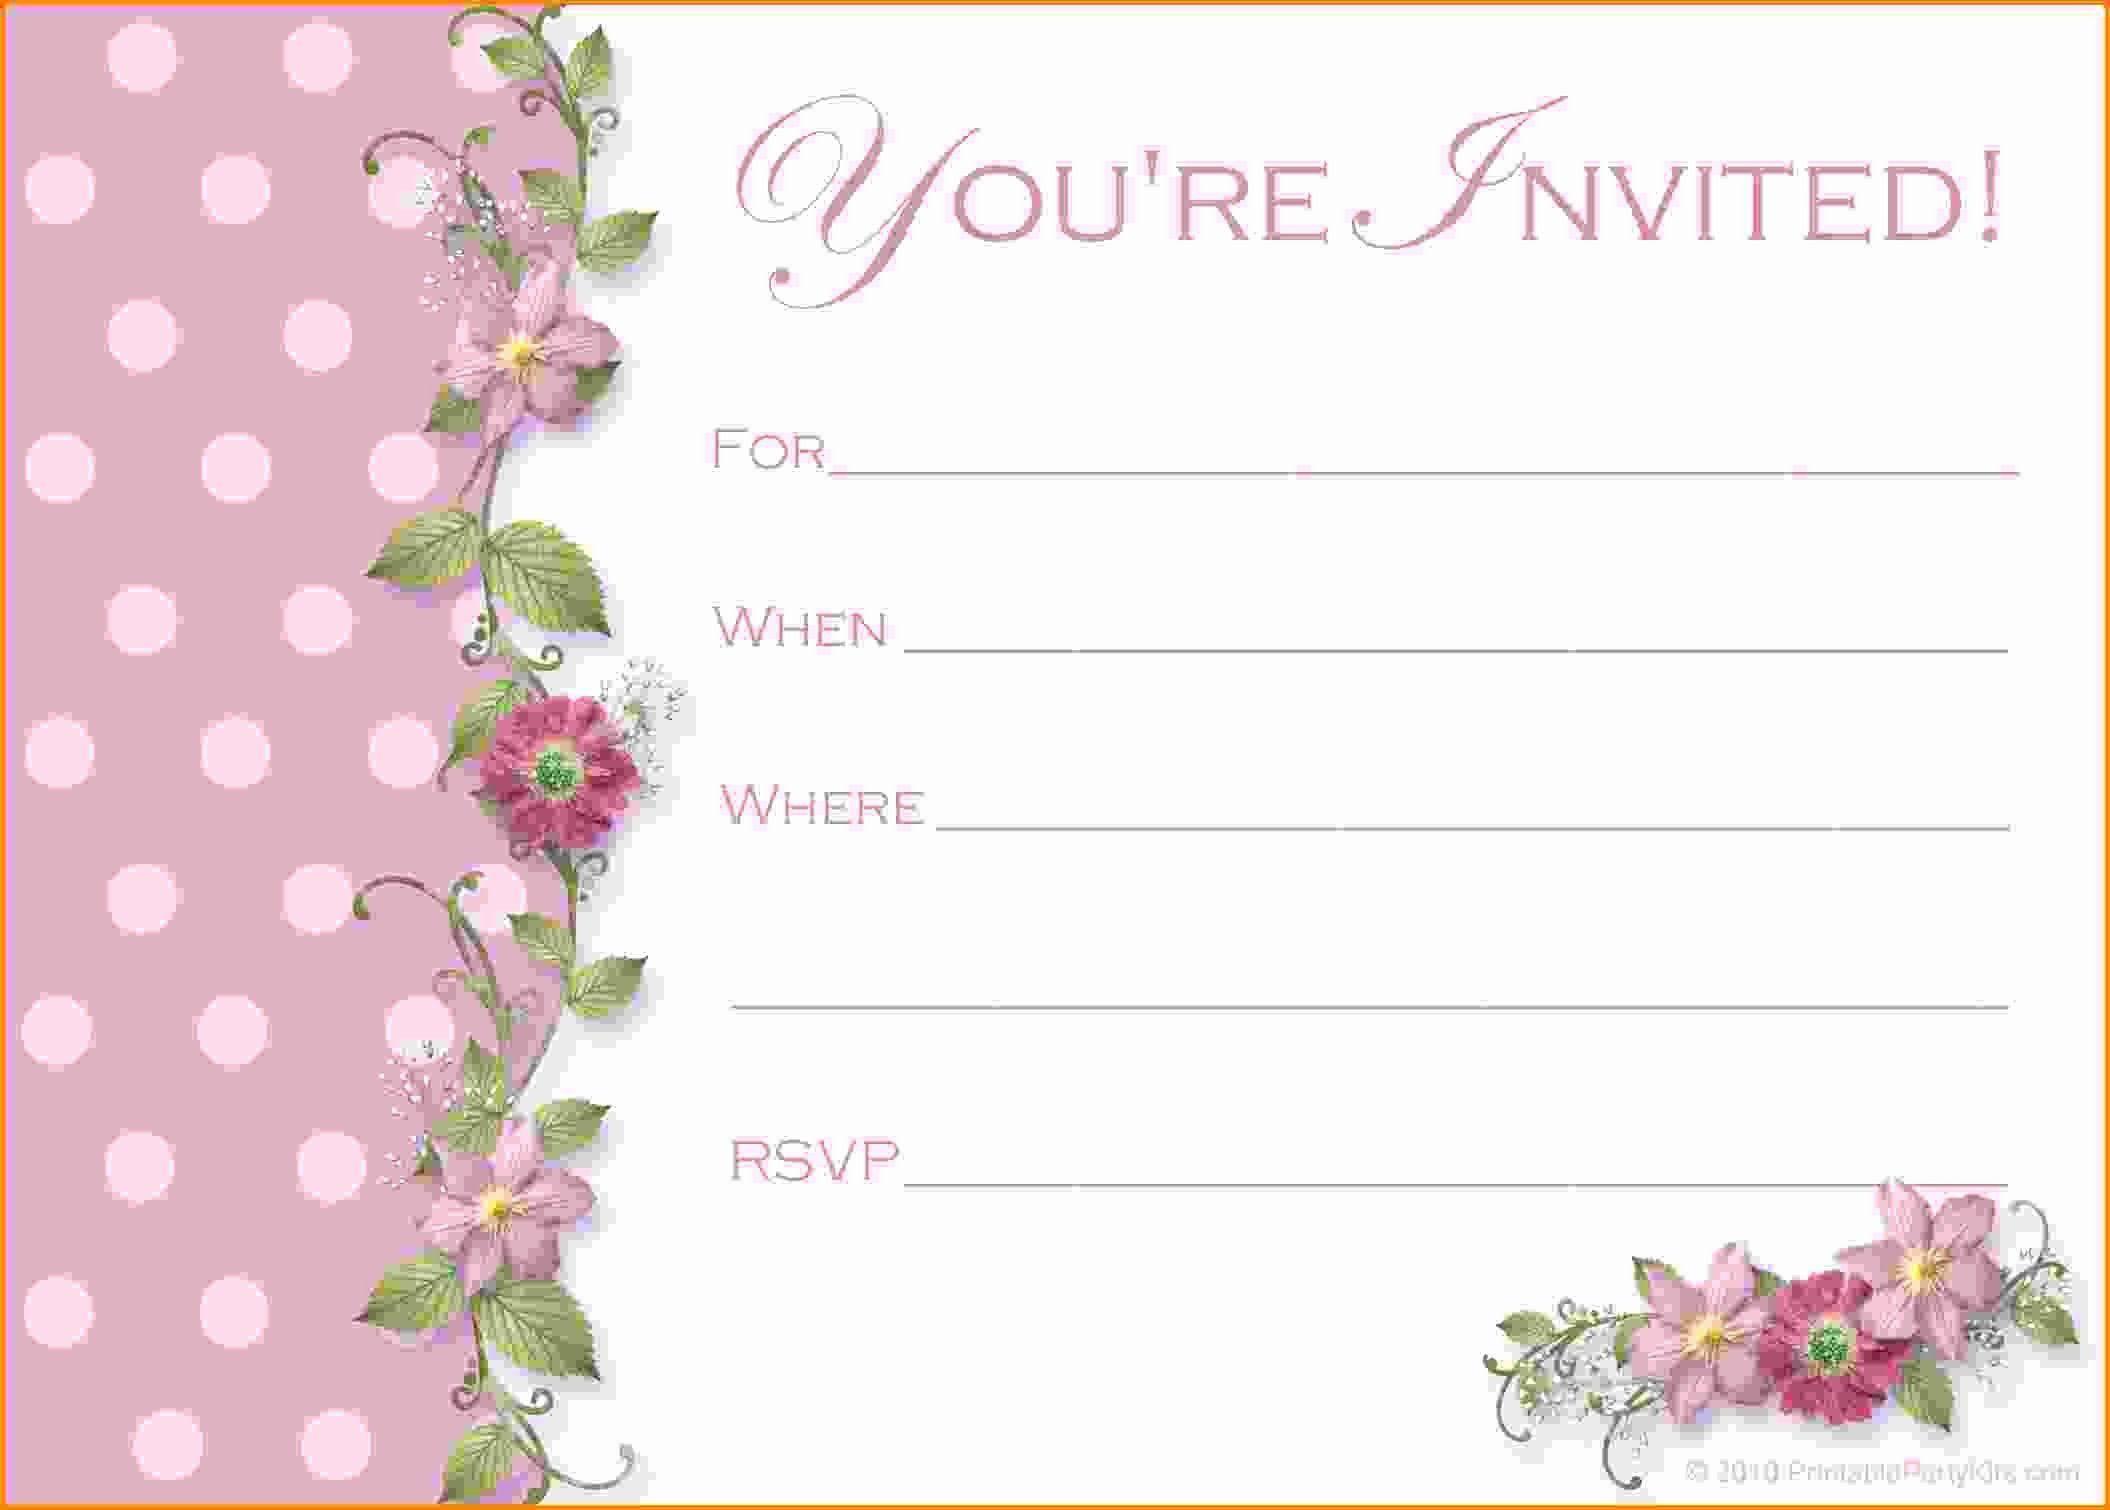 000 Phenomenal Free Birthday Party Invitation Template For Word Idea Full